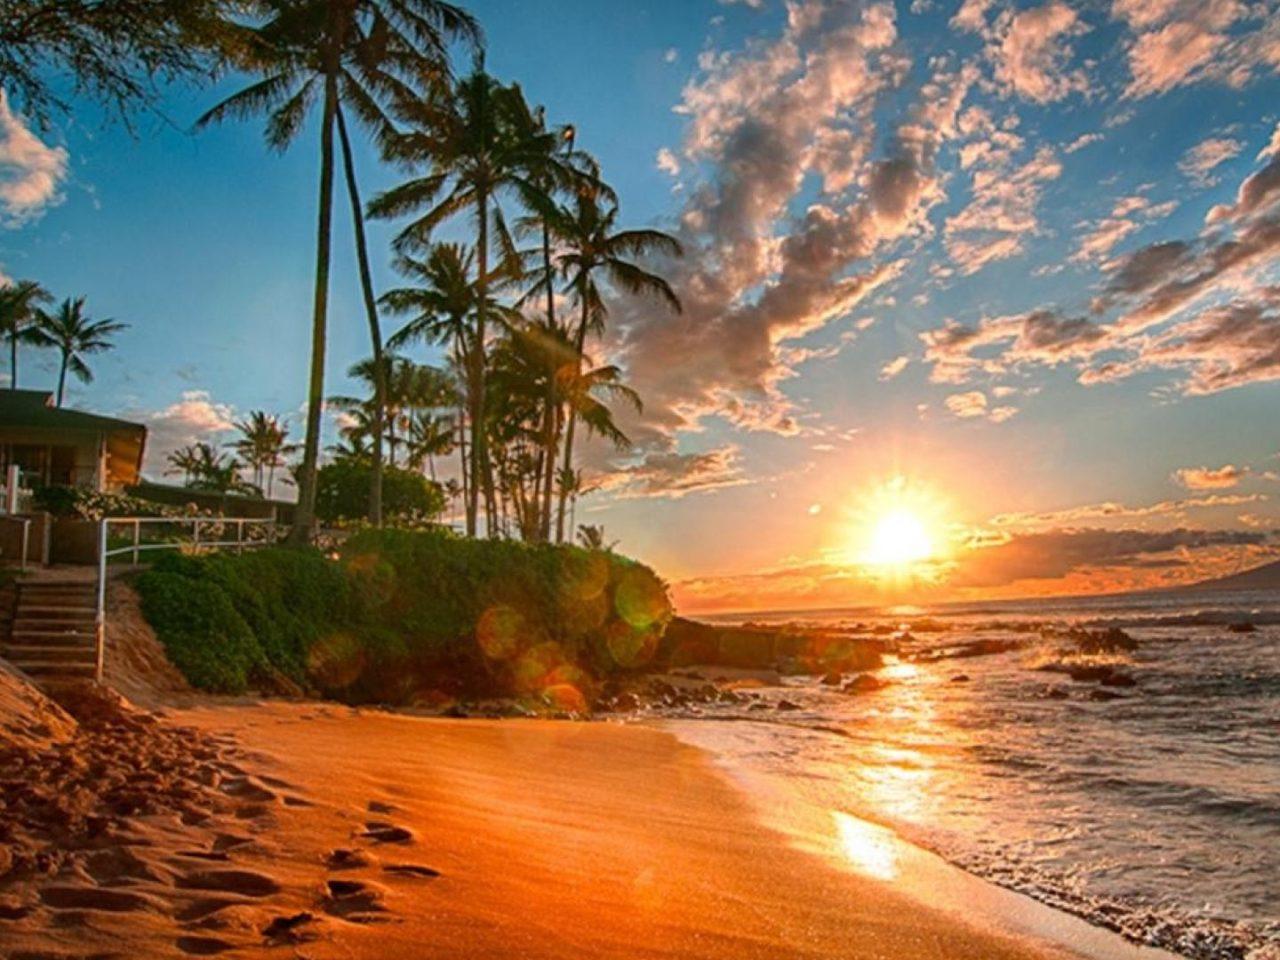 Iphone X Lock Screen Wallpaper Hawaii Exotic Wallpaper Hd Sea Sand Beach Palms Green Sky